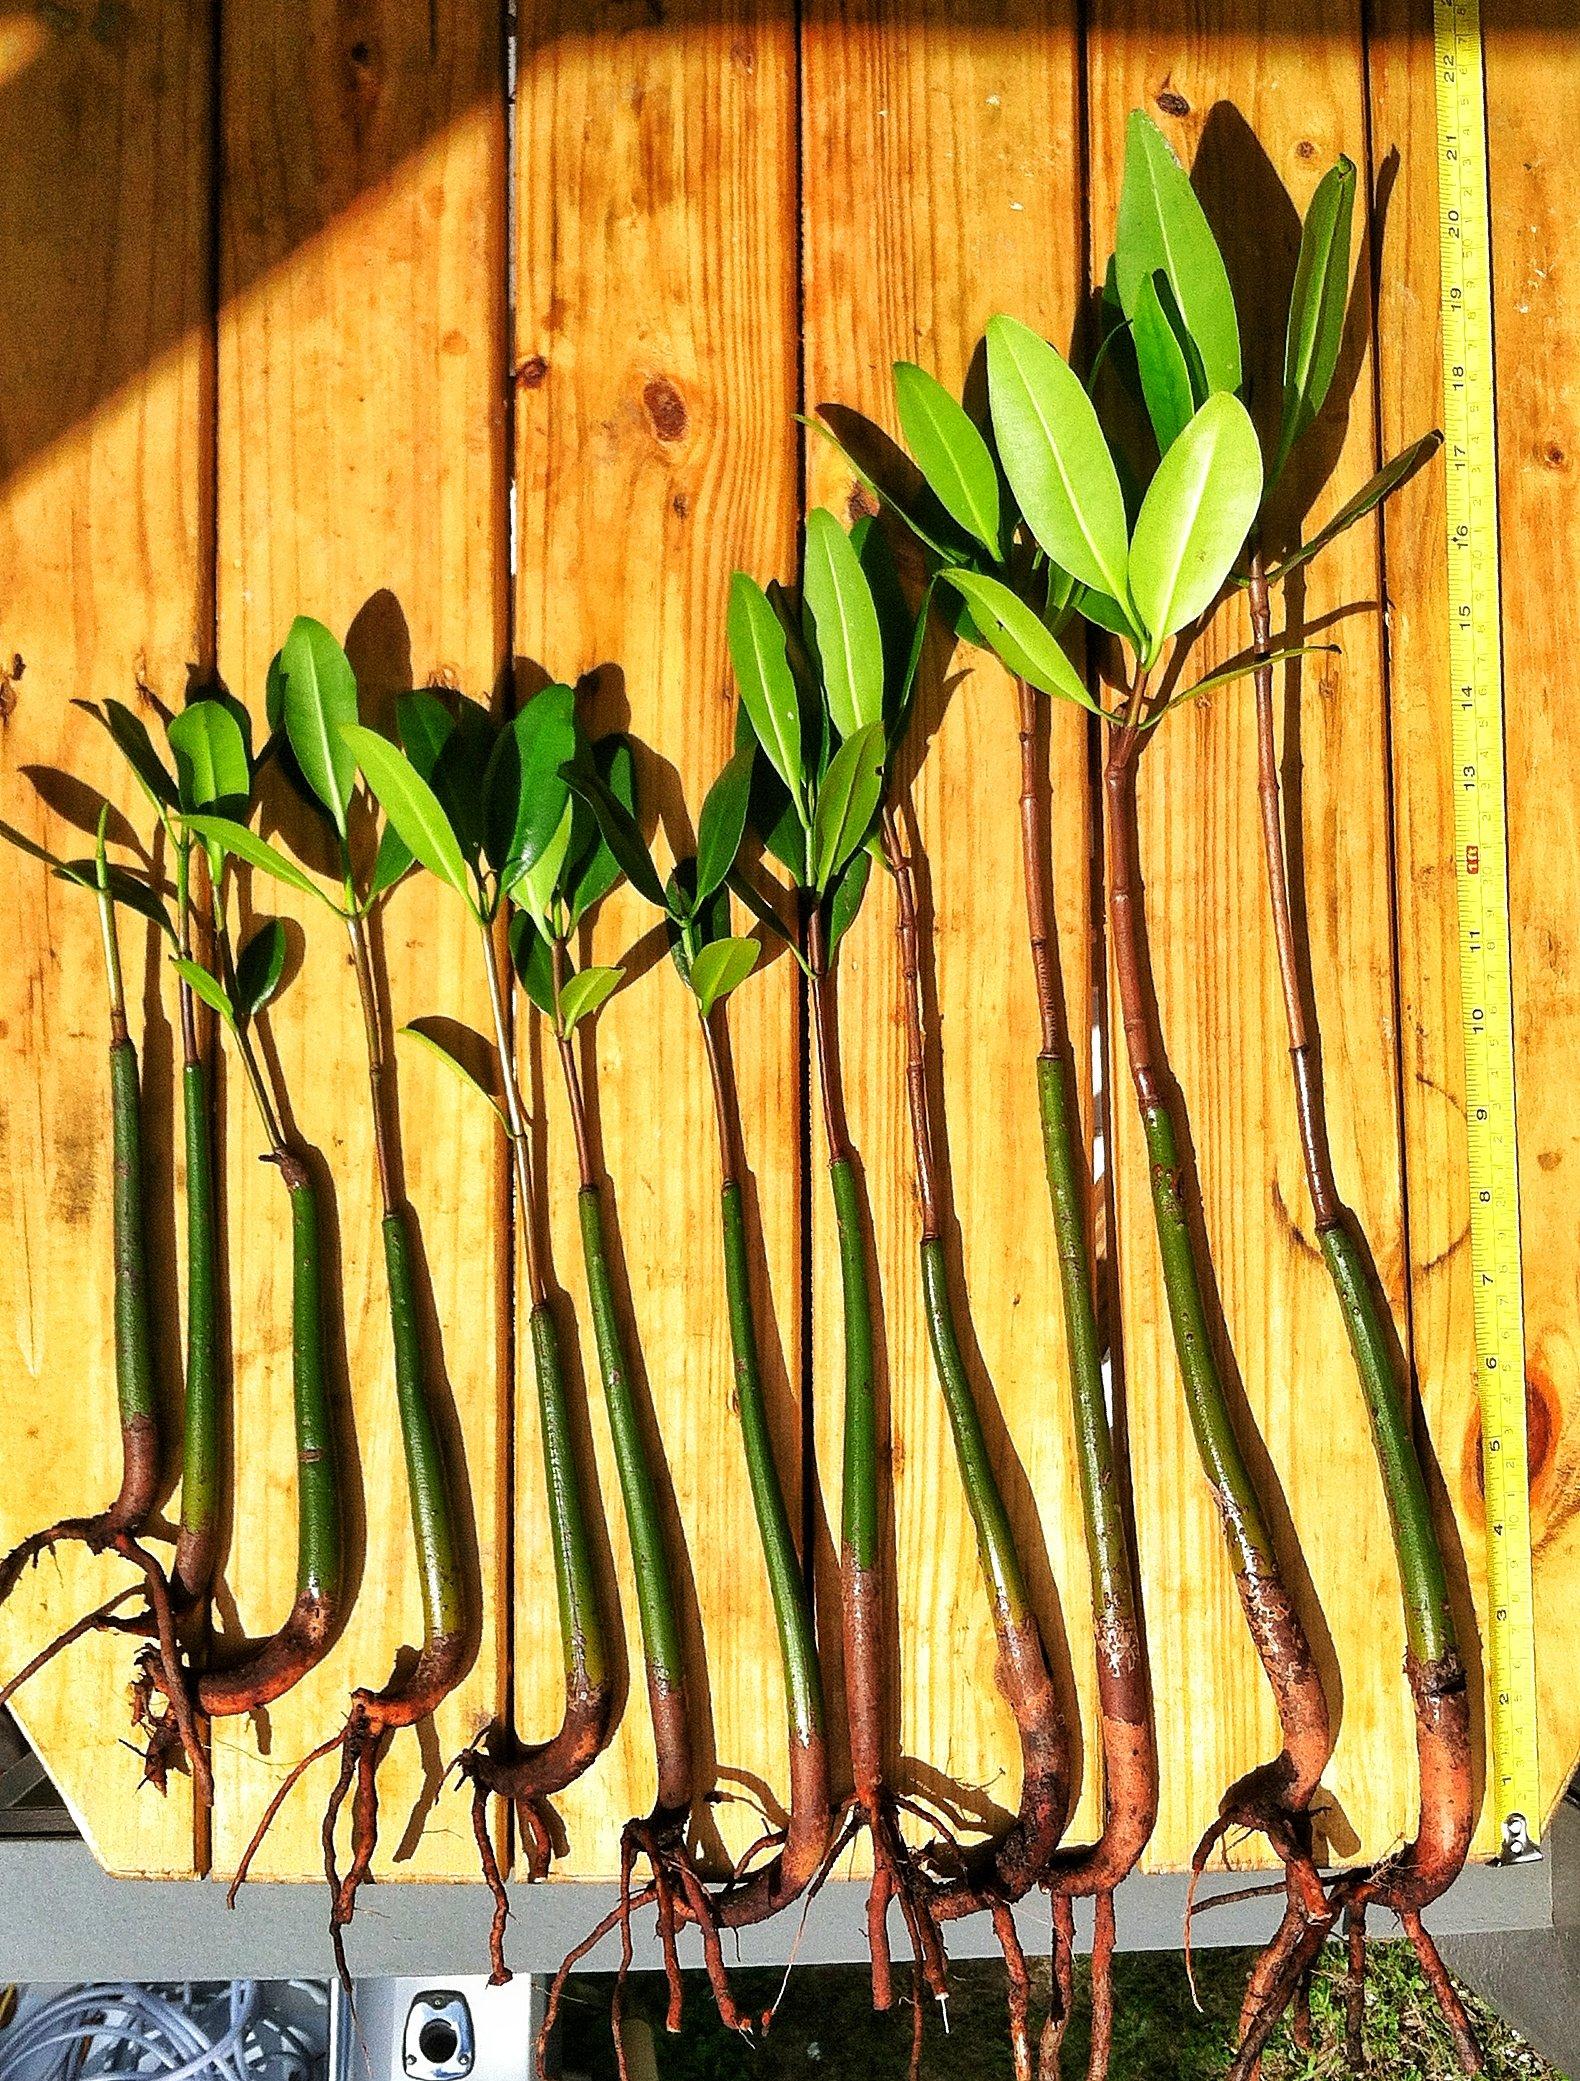 8 Healthy Strong Red Mangrove Seedlings